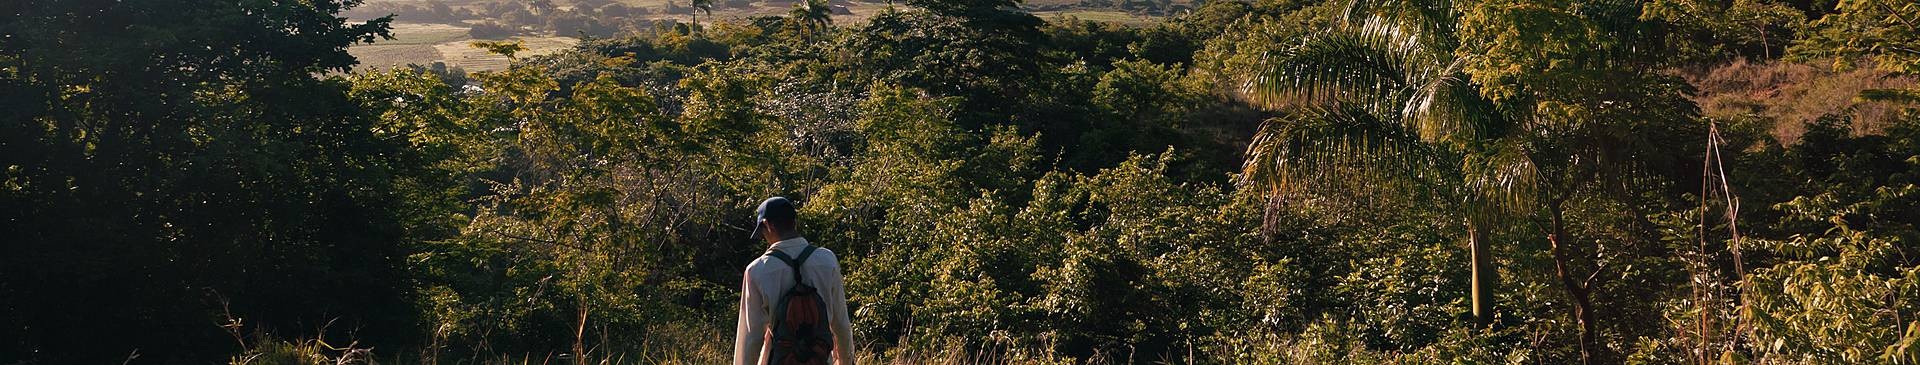 Trekking en Cuba